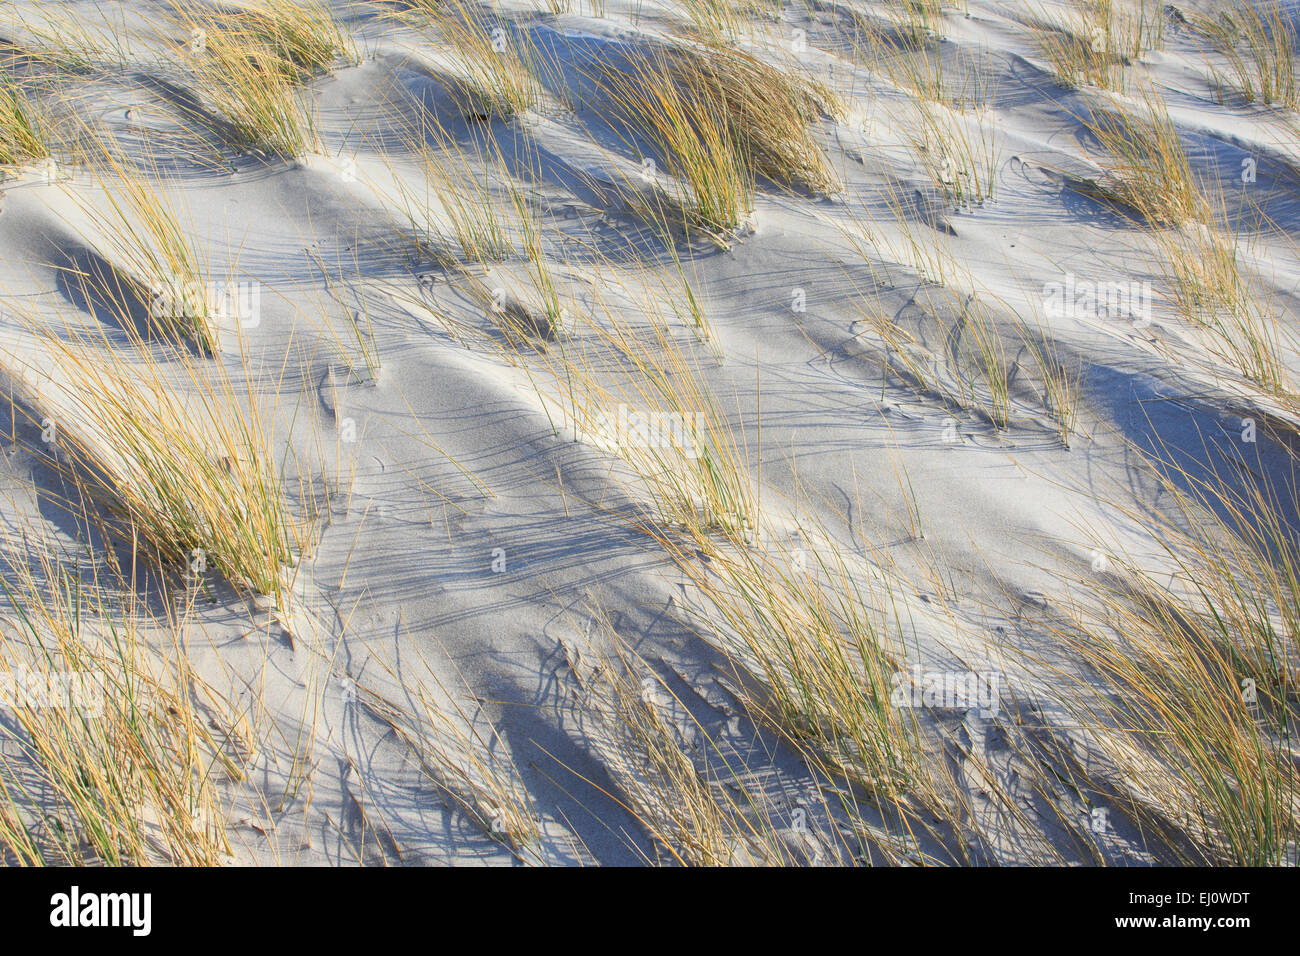 Detail, Germany, Europe, dune, dune grass, blade of grass, Helgoland, coastal vegetation, sea, seashore, pattern, - Stock Image